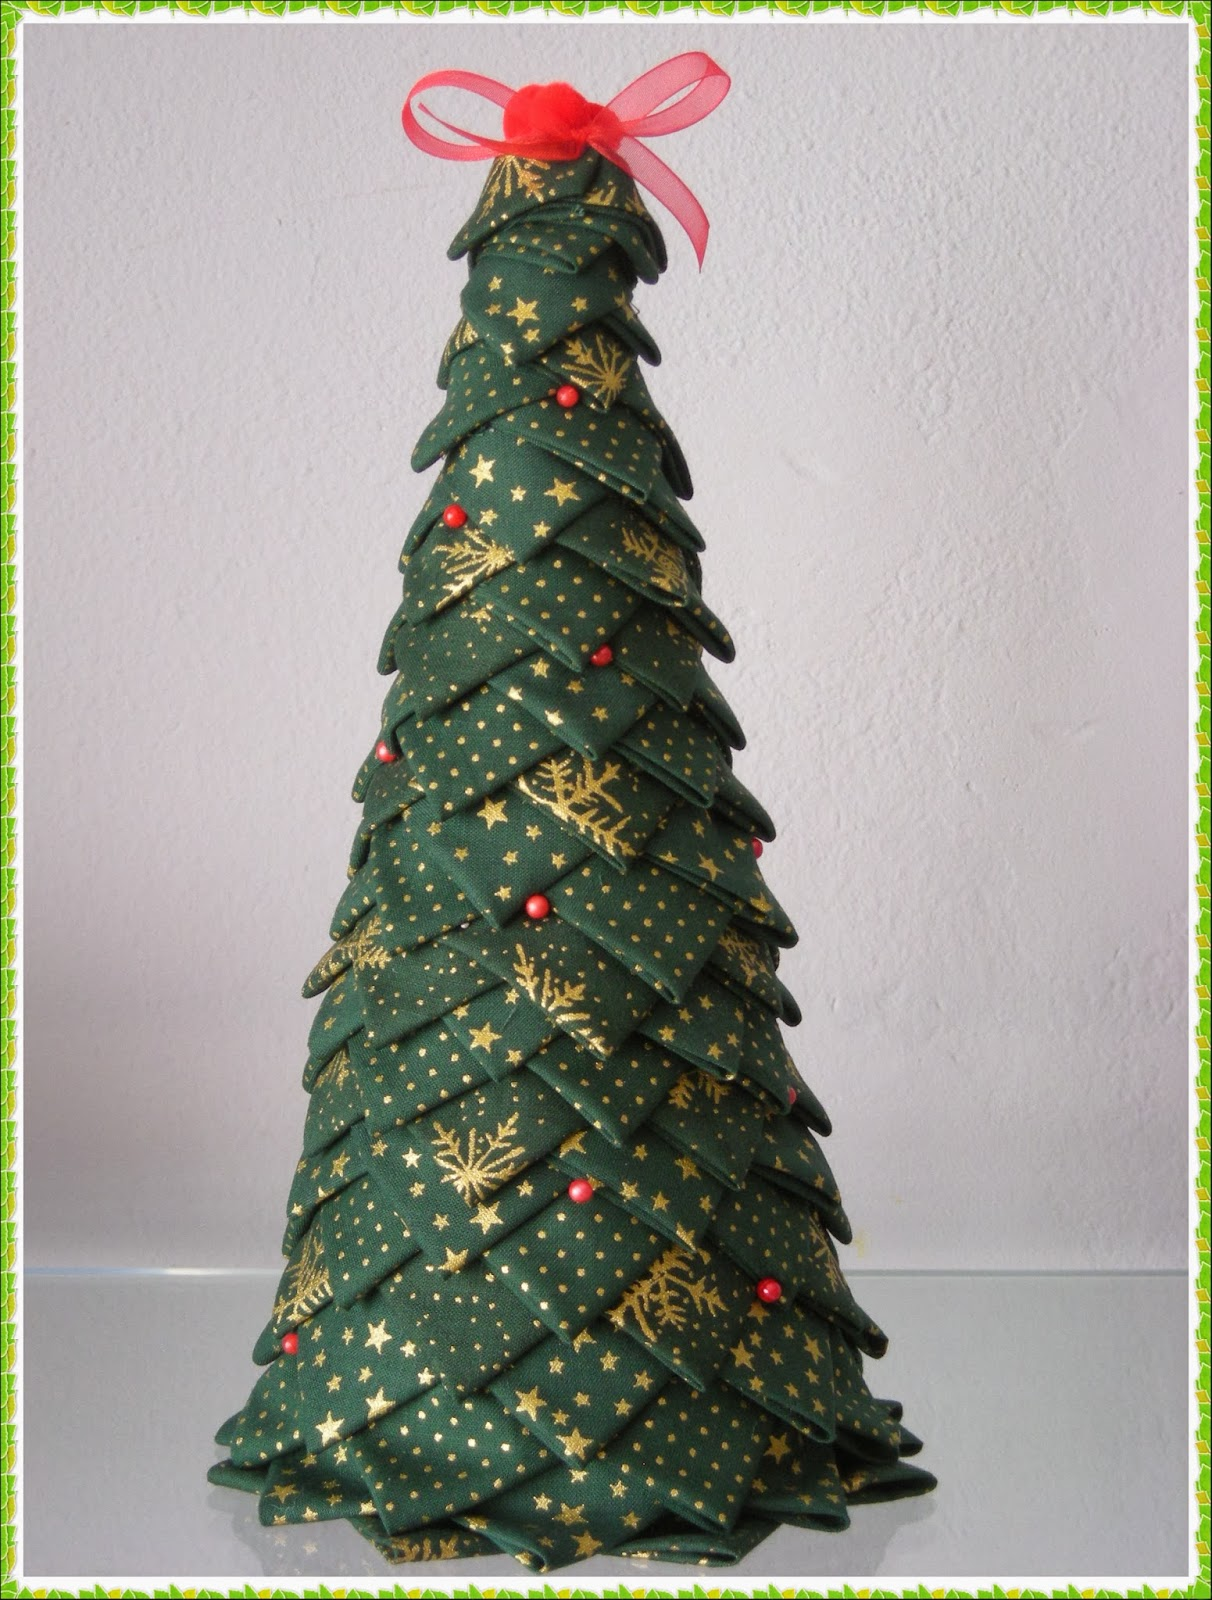 Mis pijadikas arbol de navidad en tela - Arbol de navidad de tela ...